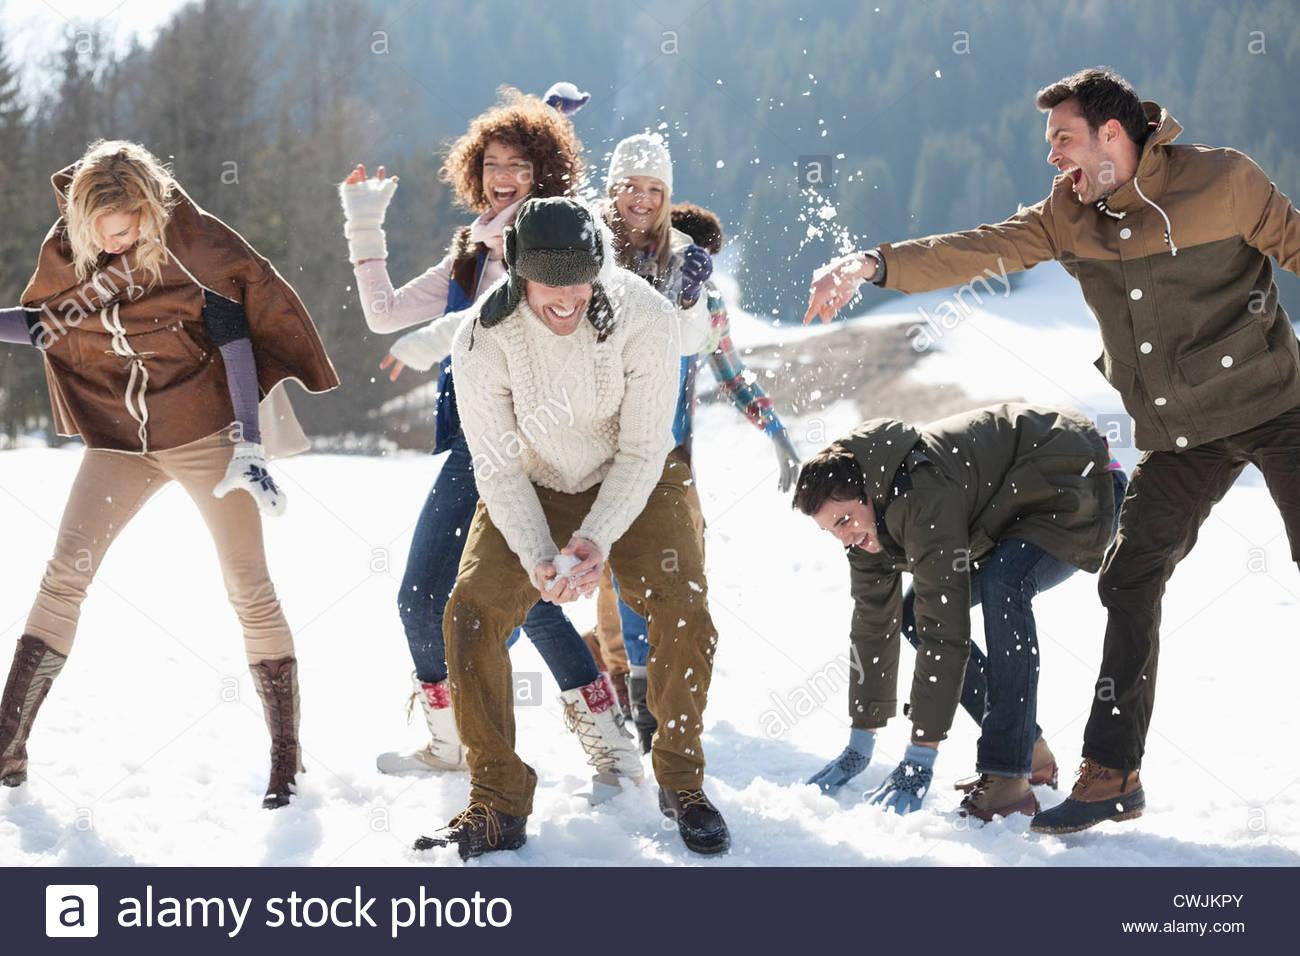 Friends enjoying snowball fight in field - Stock Image